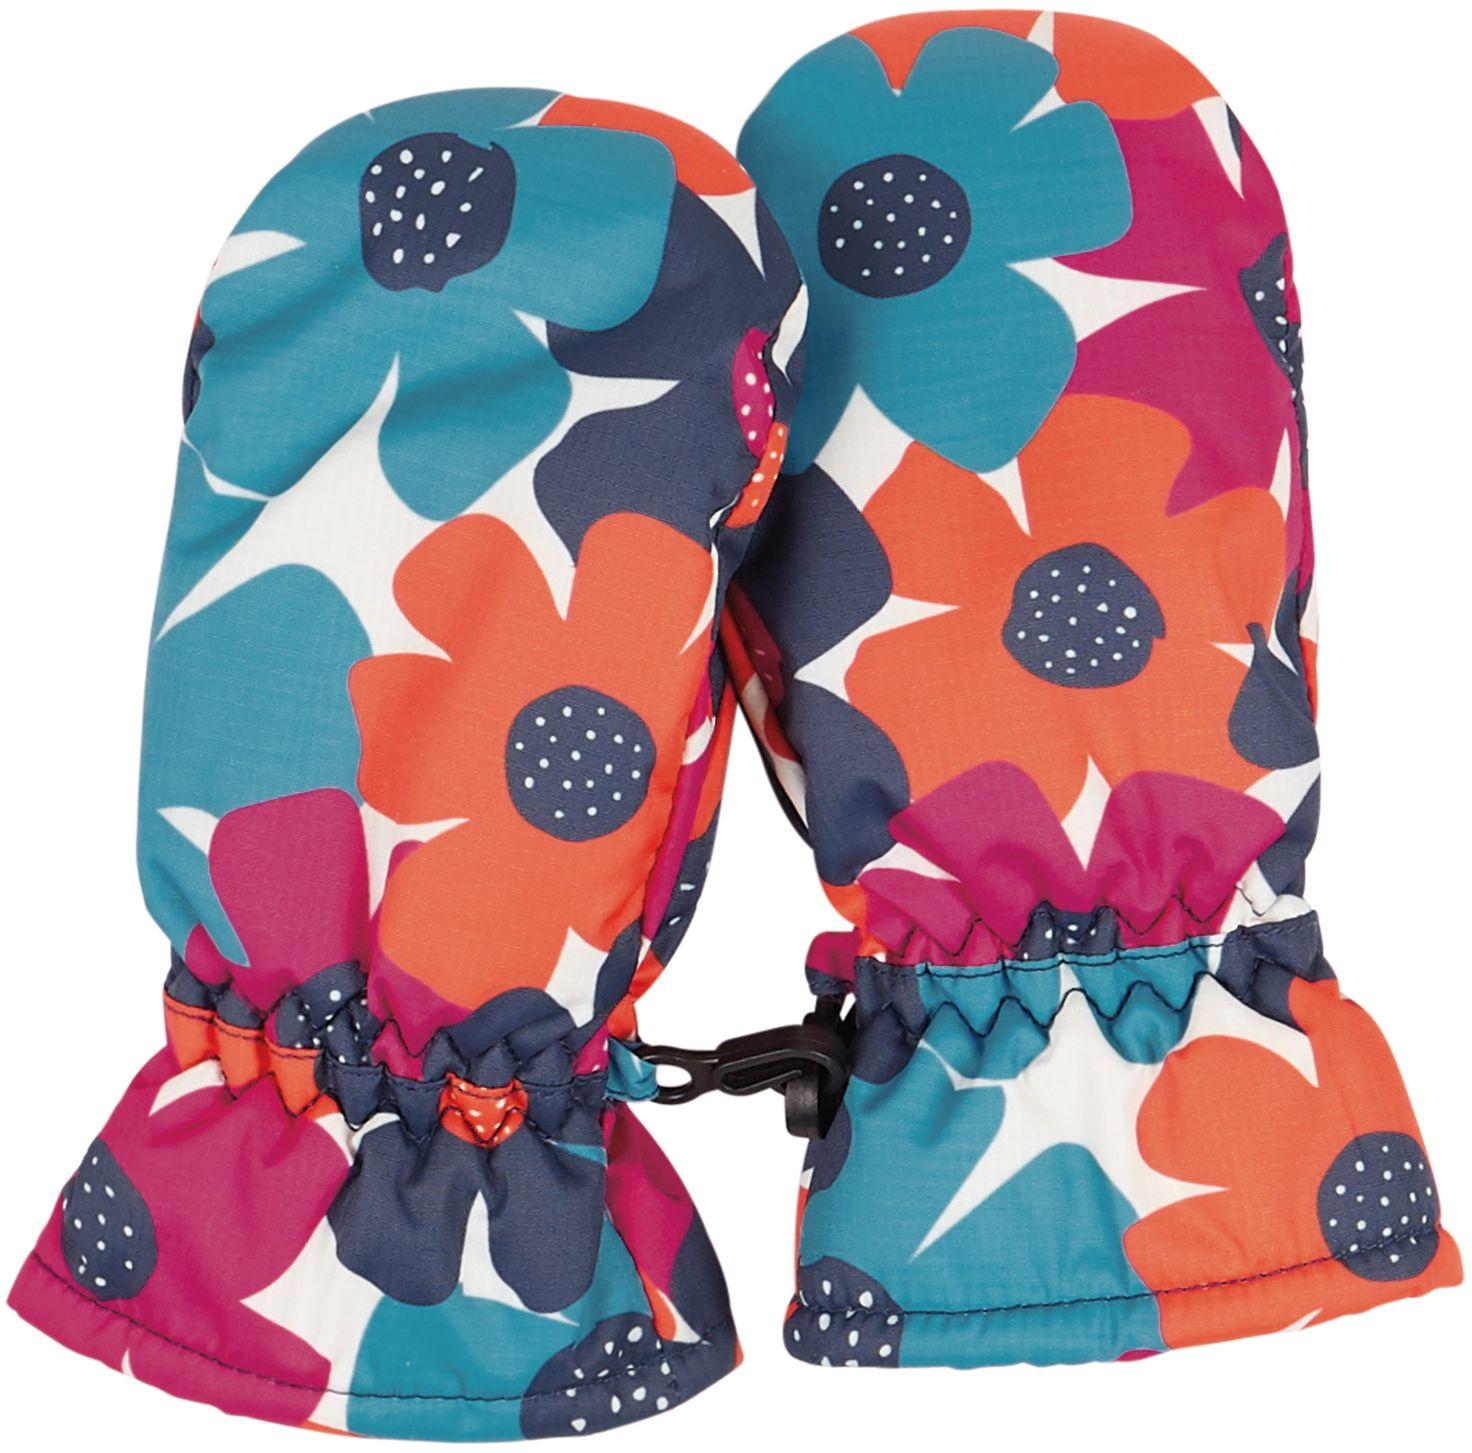 Kinder-Handschuhe mit buntem Blumen-Muster